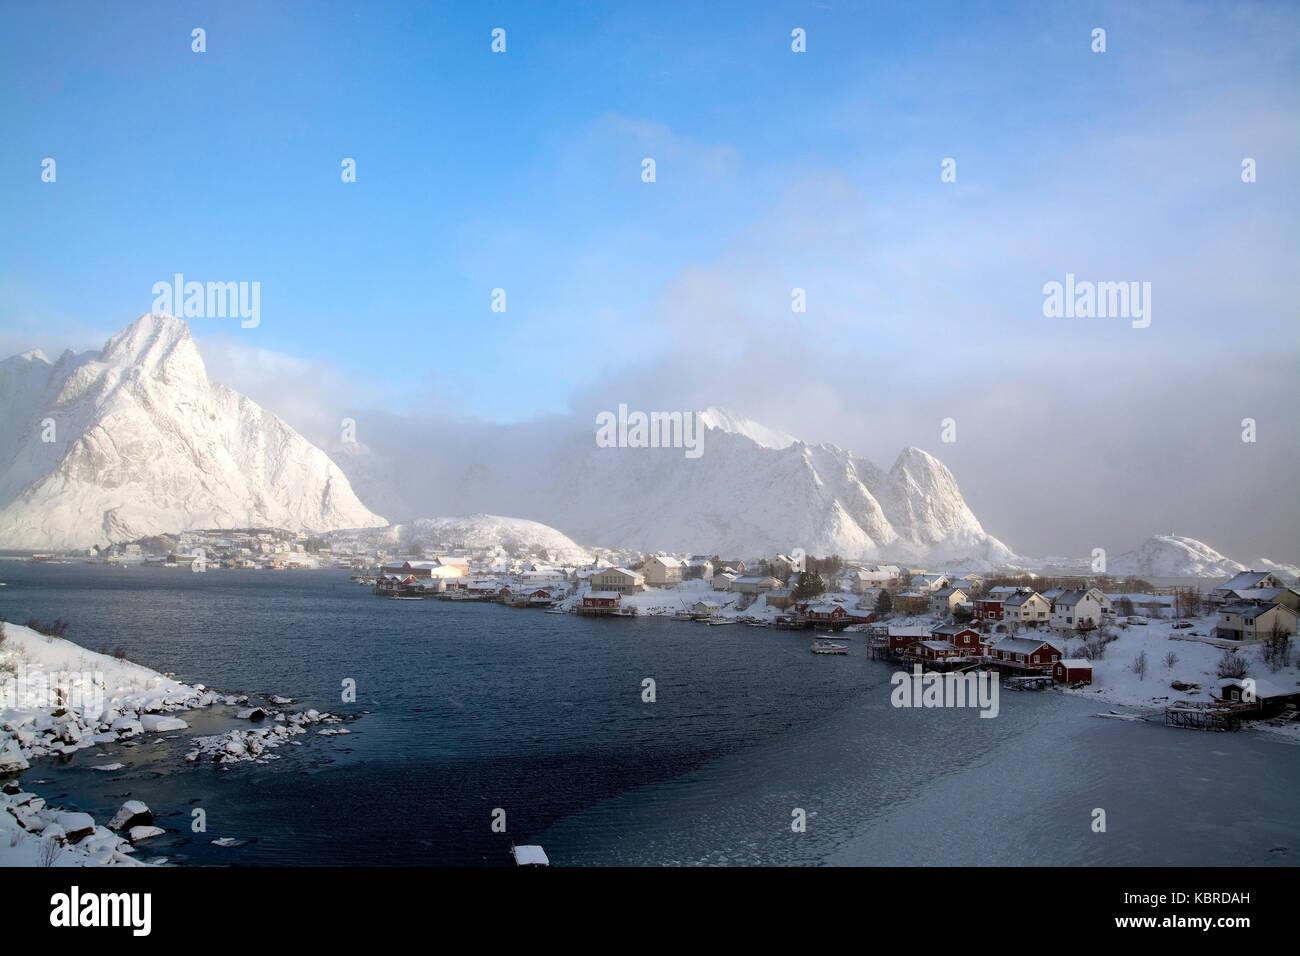 In the morning on the Lofoten in the town pure in Norway., Morgens auf den Lofoten an der Stadt Reine in Norwegen. - Stock Image